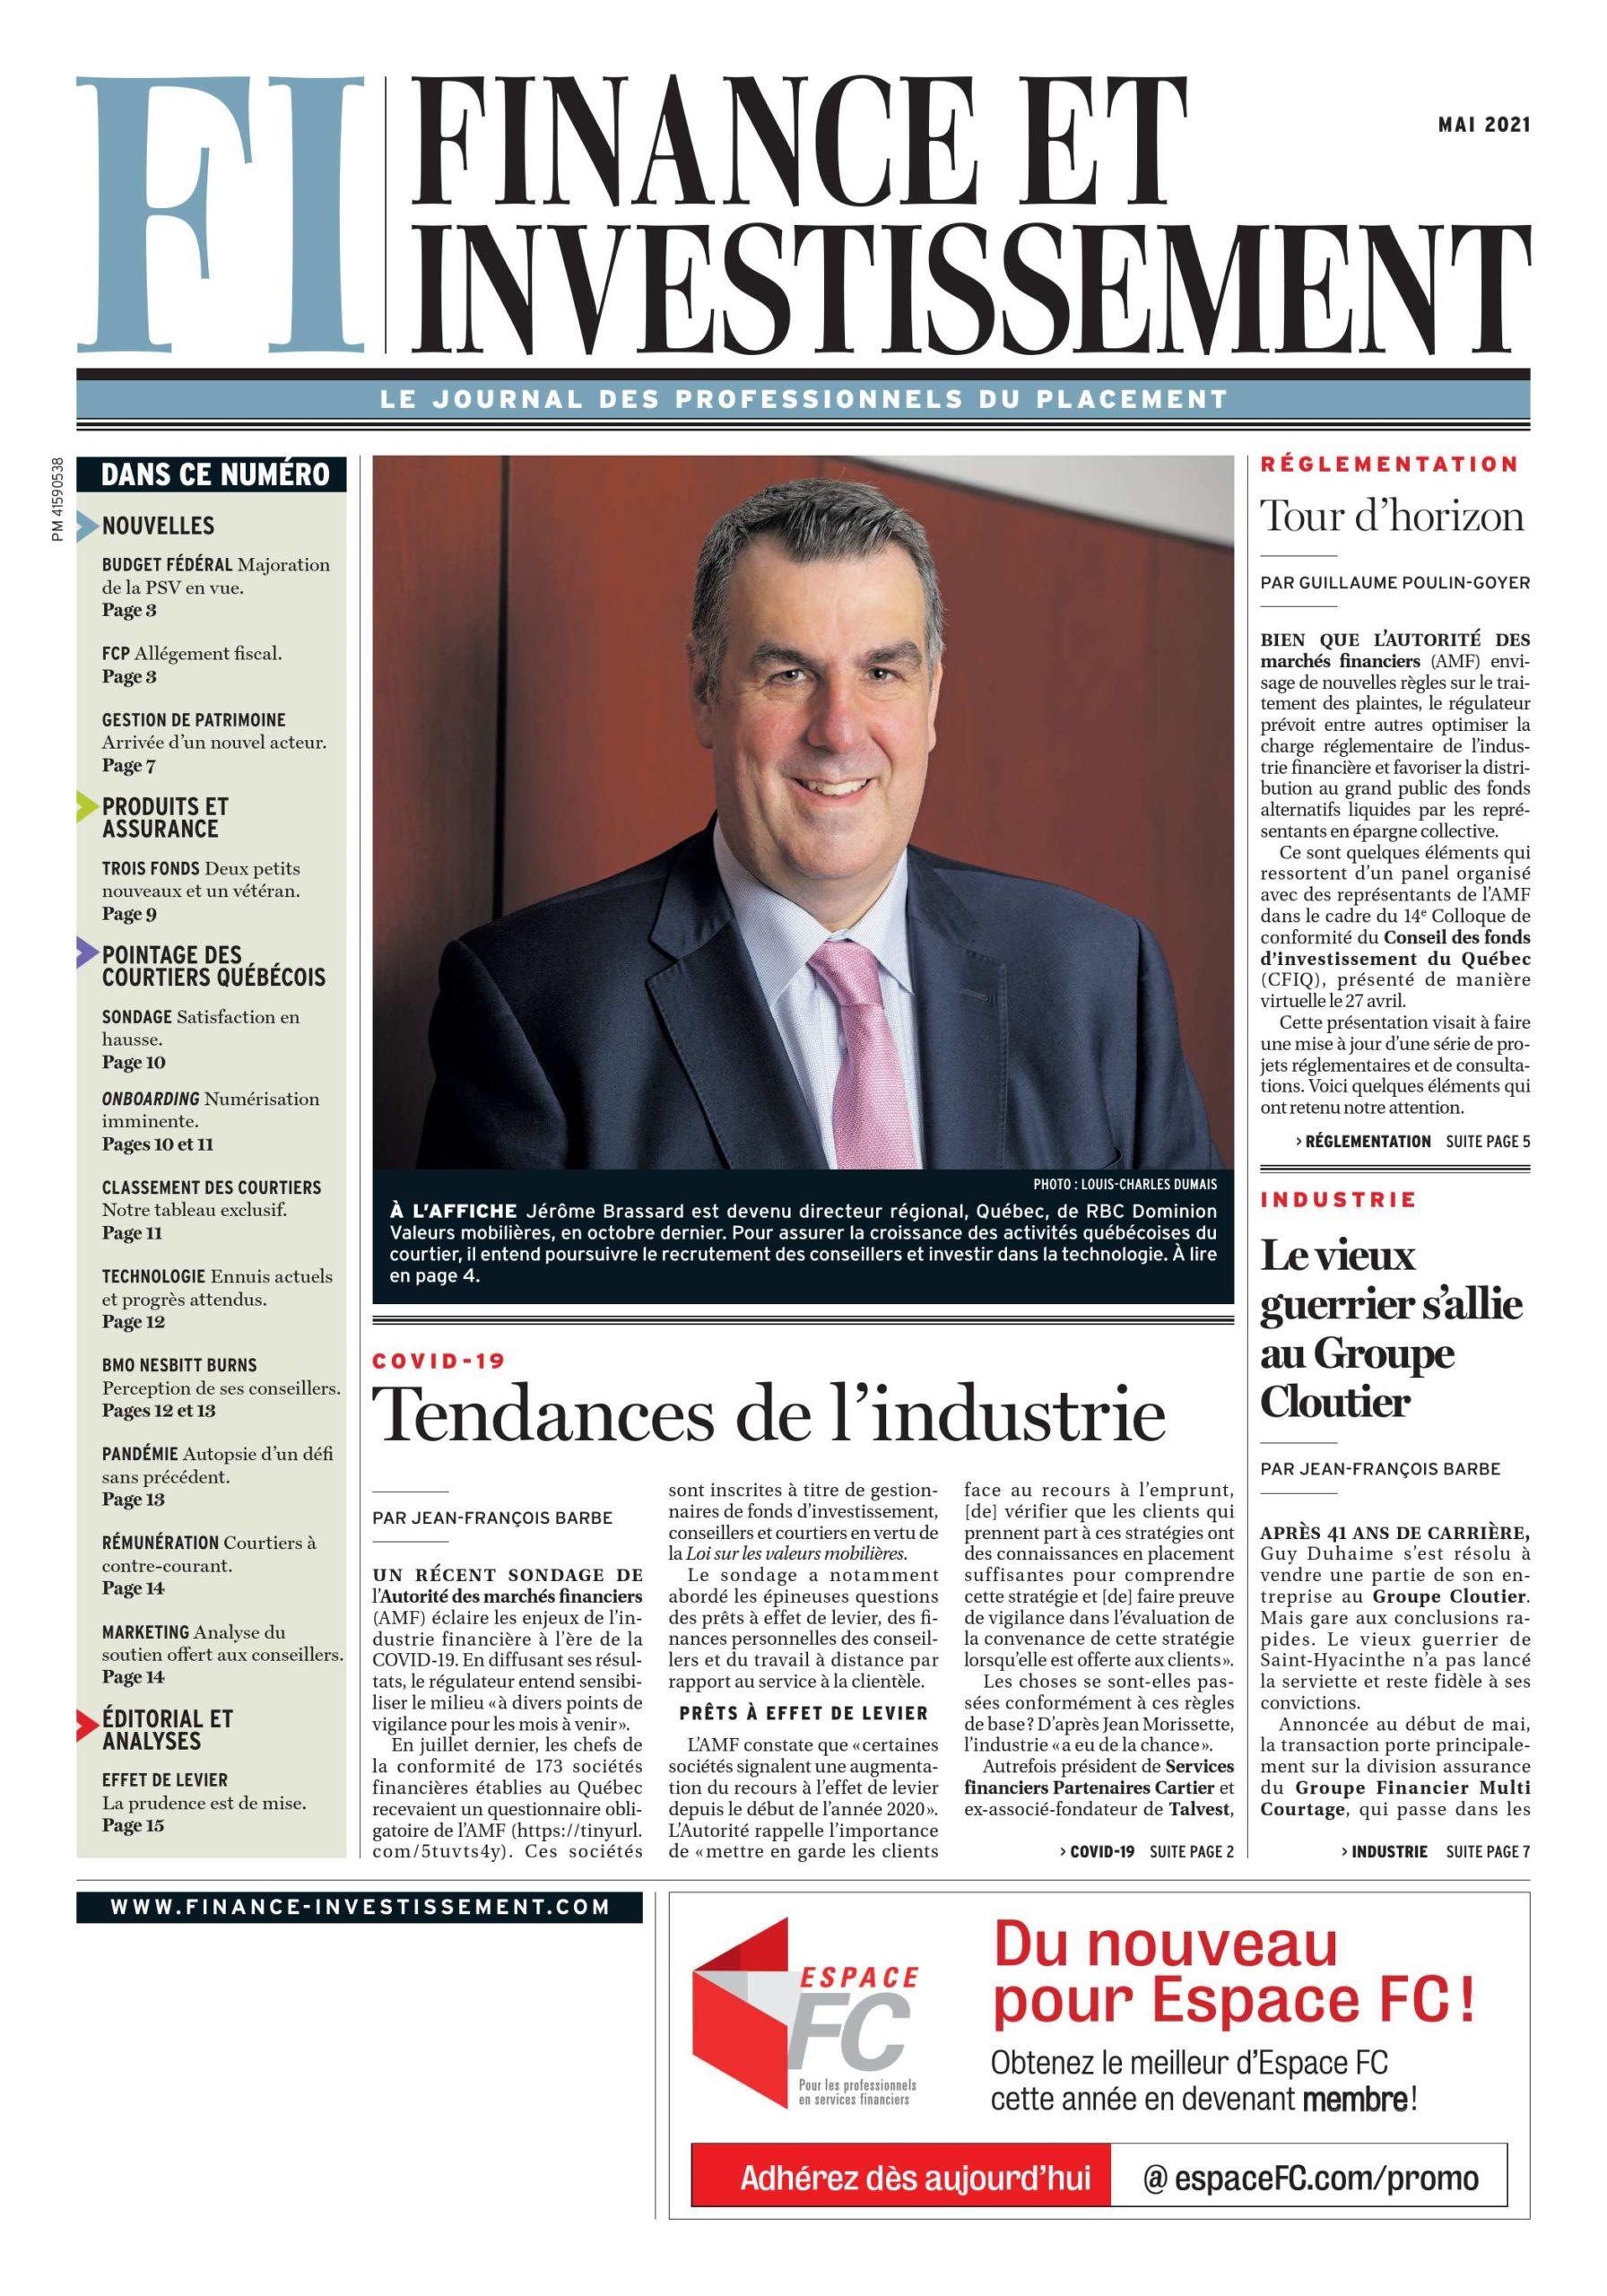 Finance et Investissement – 1 mai 2021